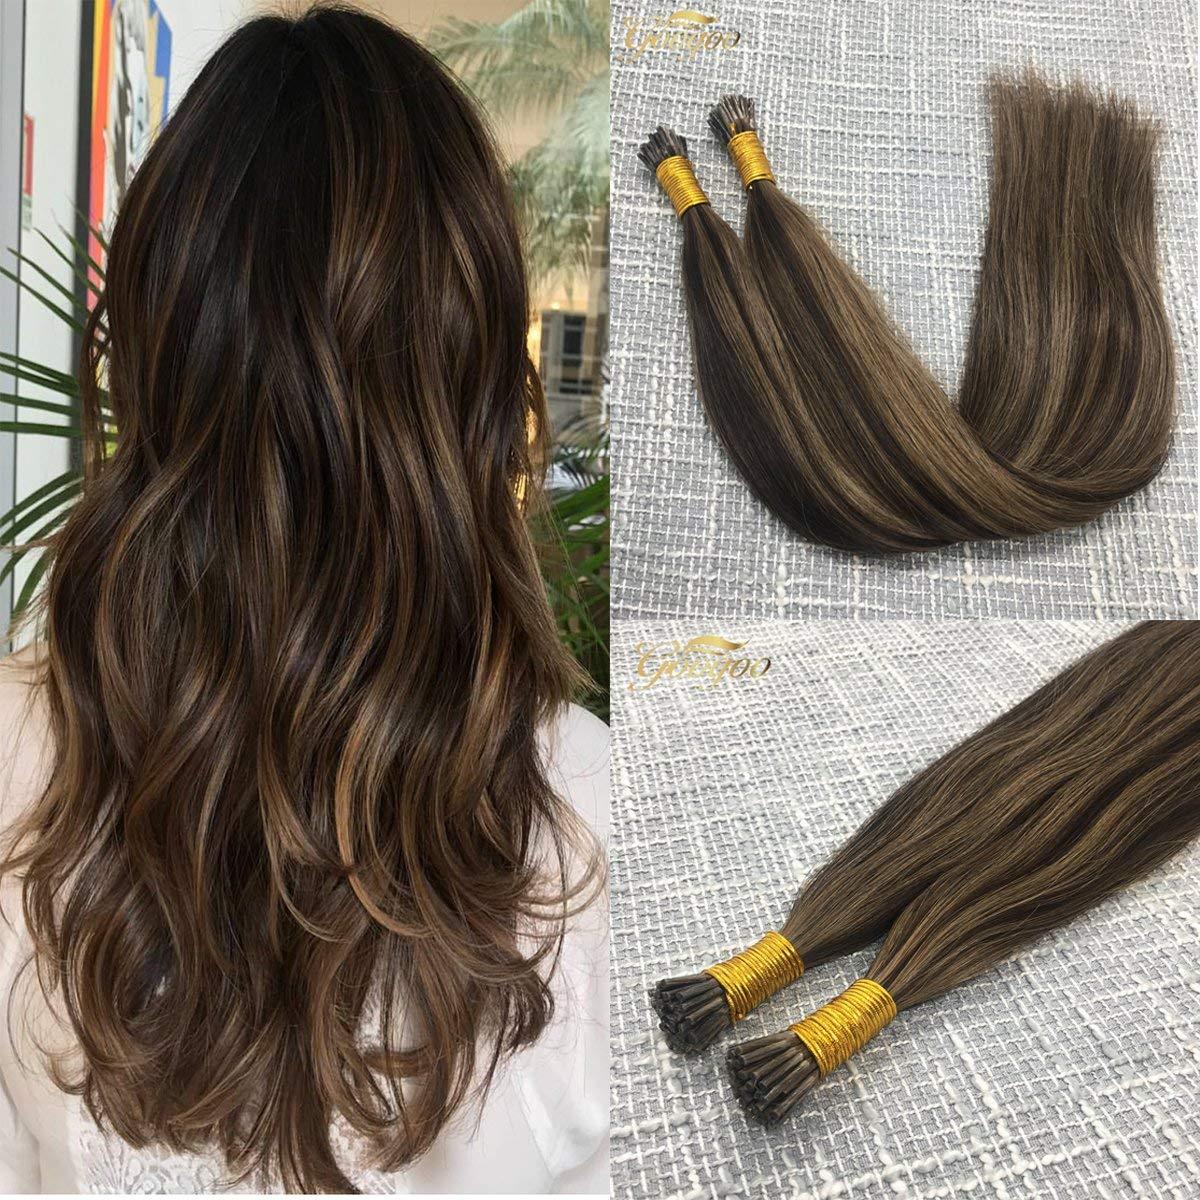 Cheap 24 Inch Fusion Hair Extensions Find 24 Inch Fusion Hair